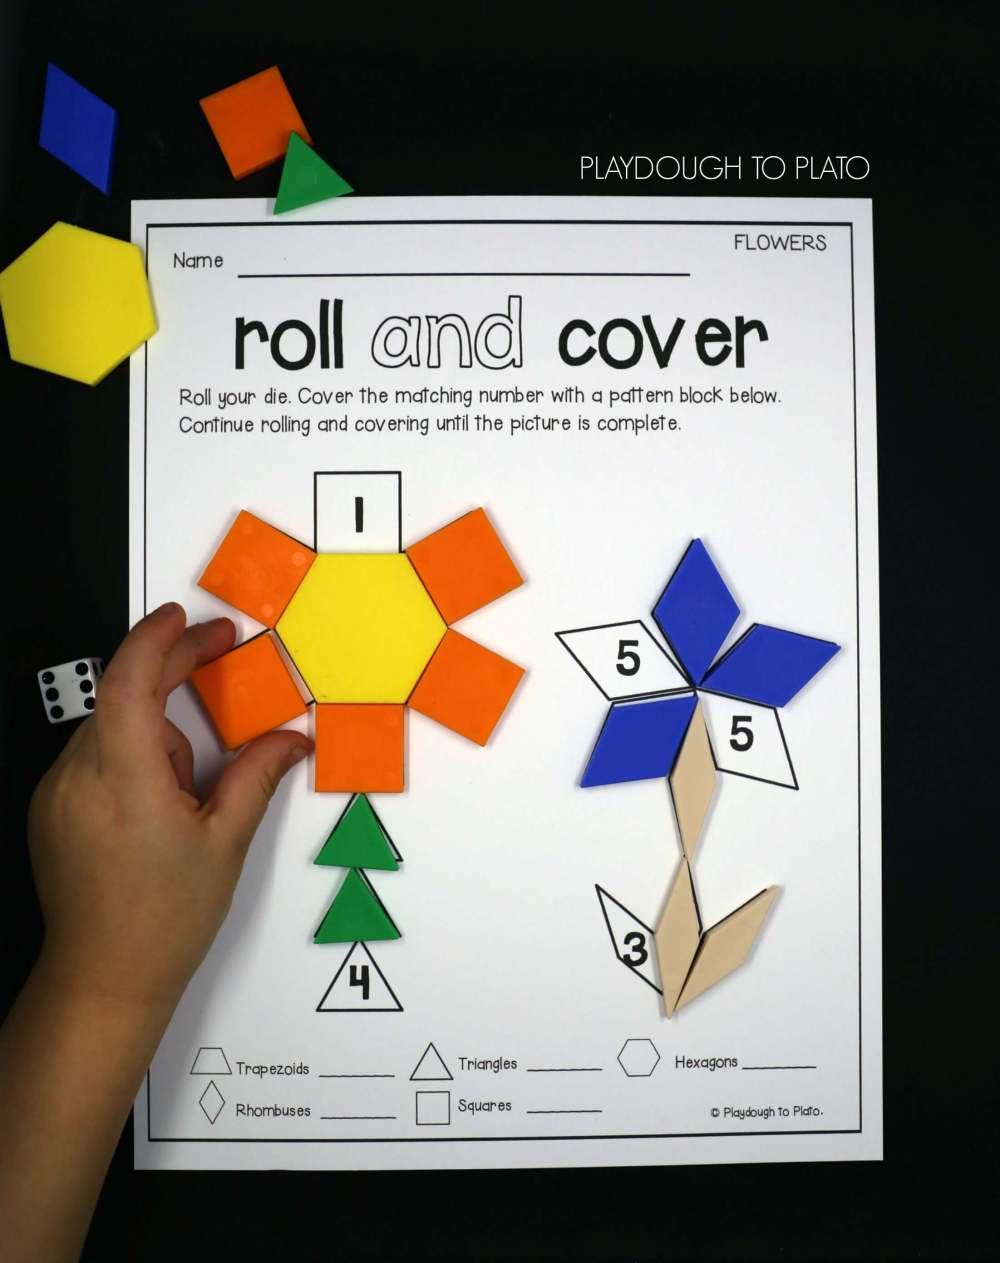 medium resolution of Roll and Cover Pattern Block Mats - Playdough To Plato